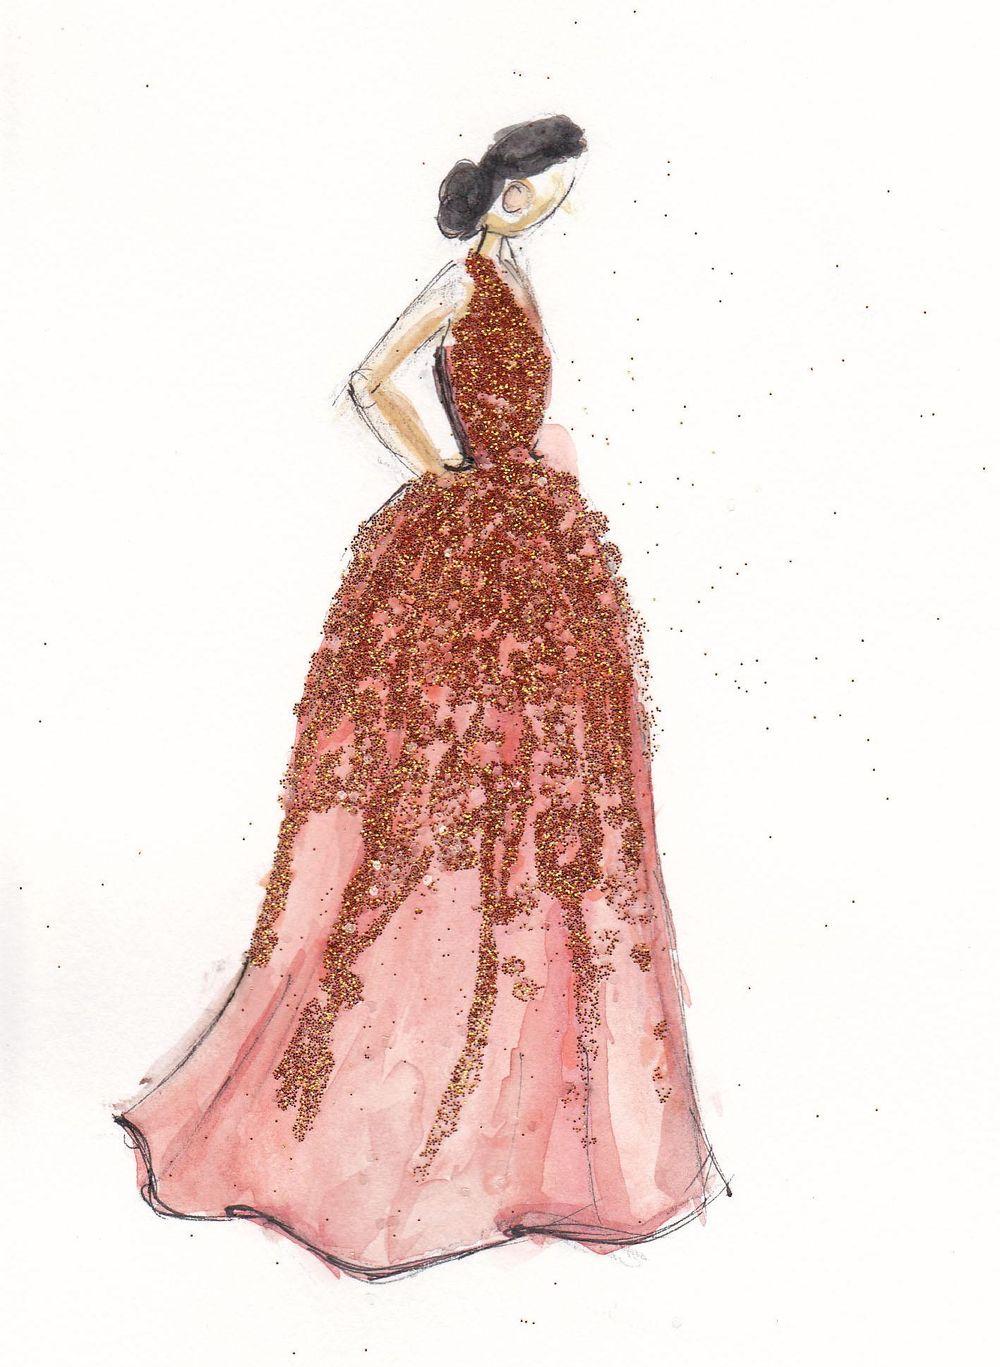 Final | Coral & Embellished - image 1 - student project